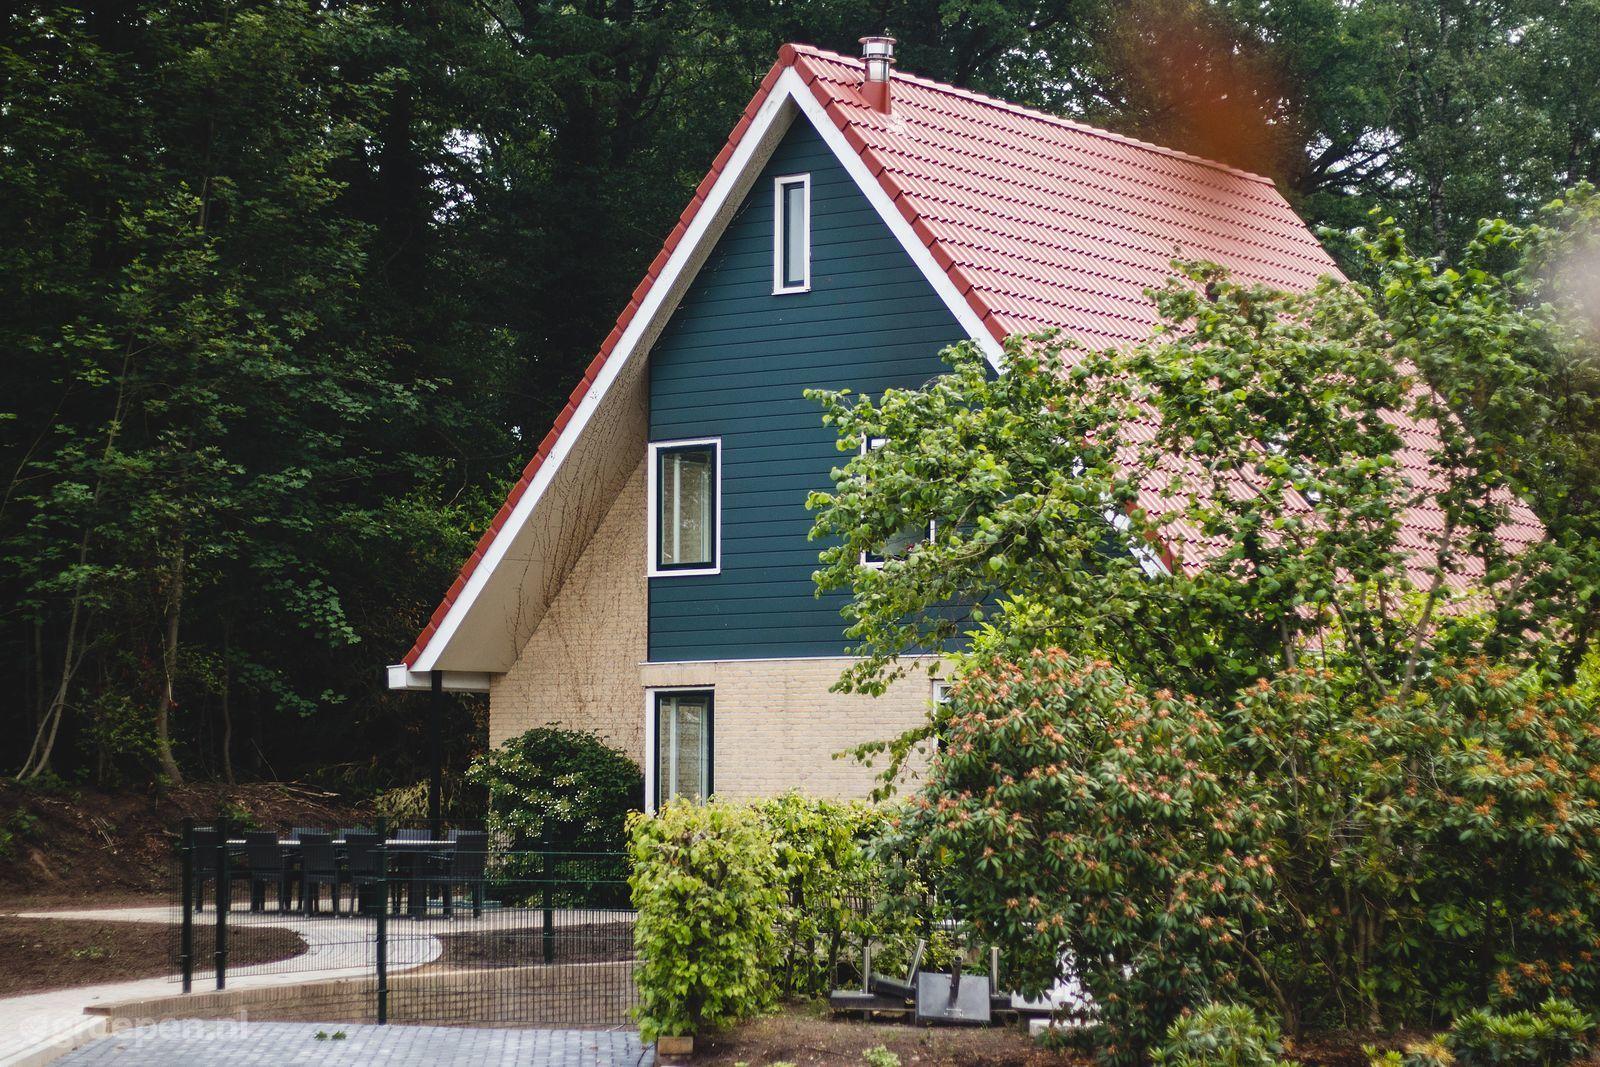 Holidayhome Wierden-Hoge Hexel